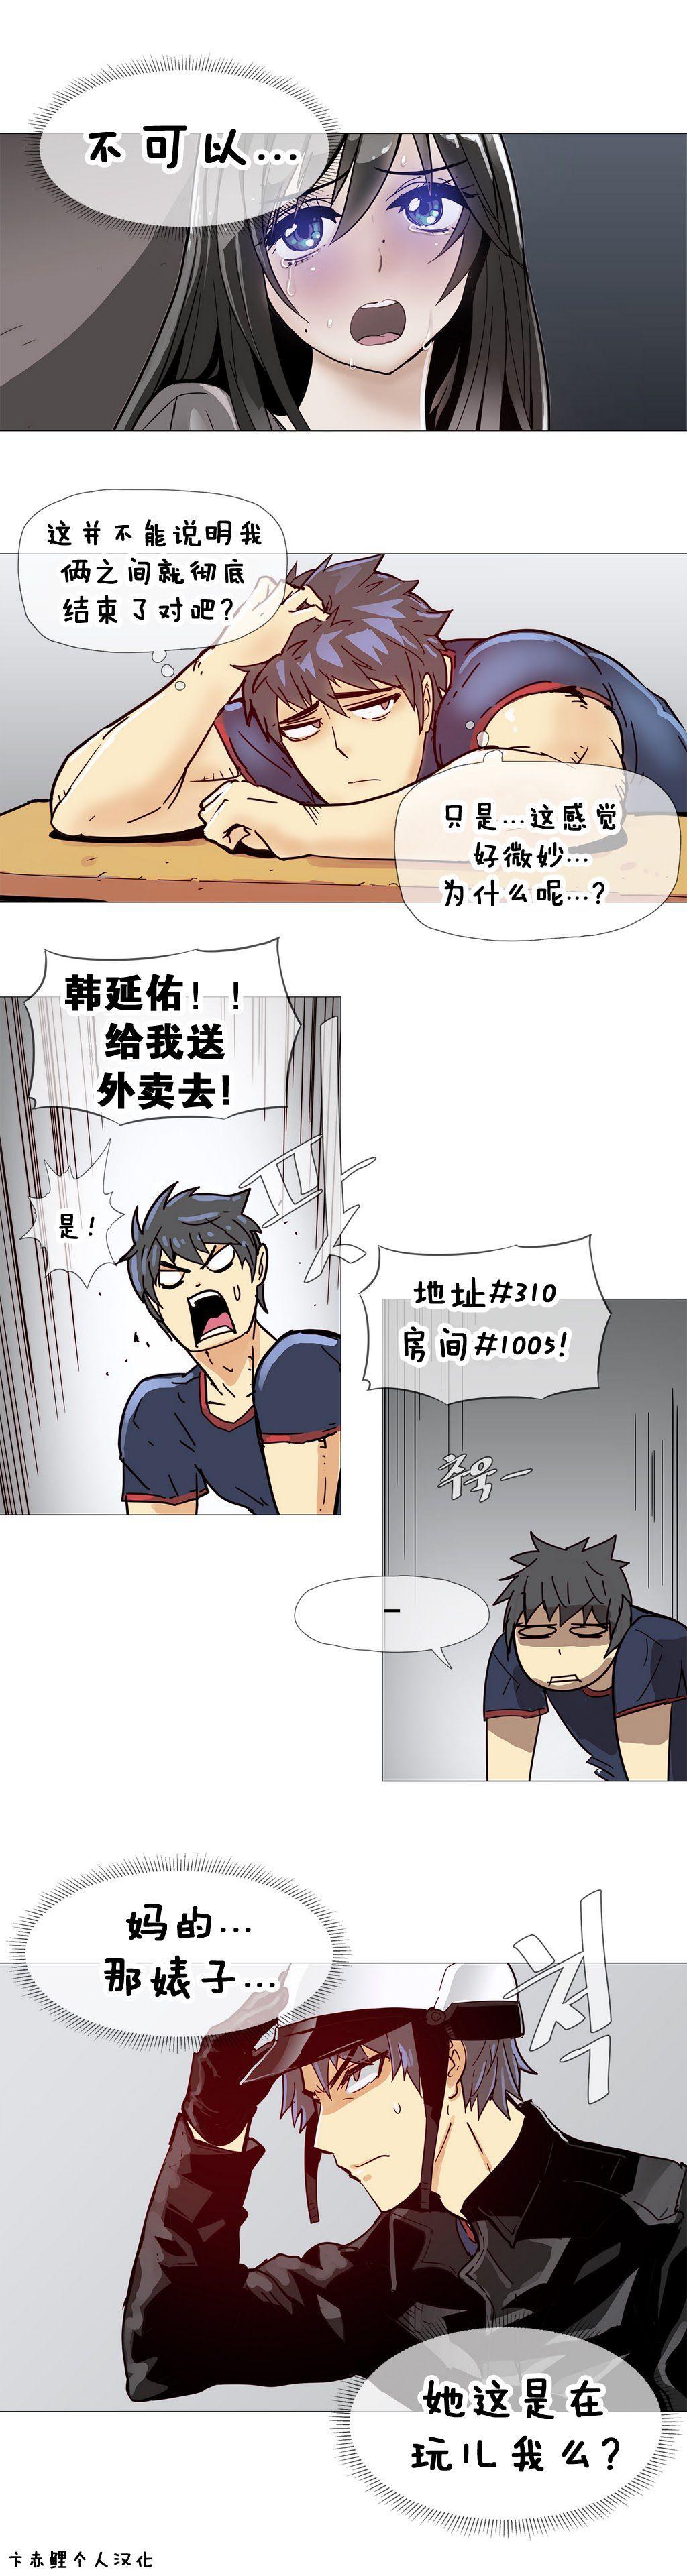 HouseHold Affairs 【卞赤鲤个人汉化】1~33话(持续更新中) 237